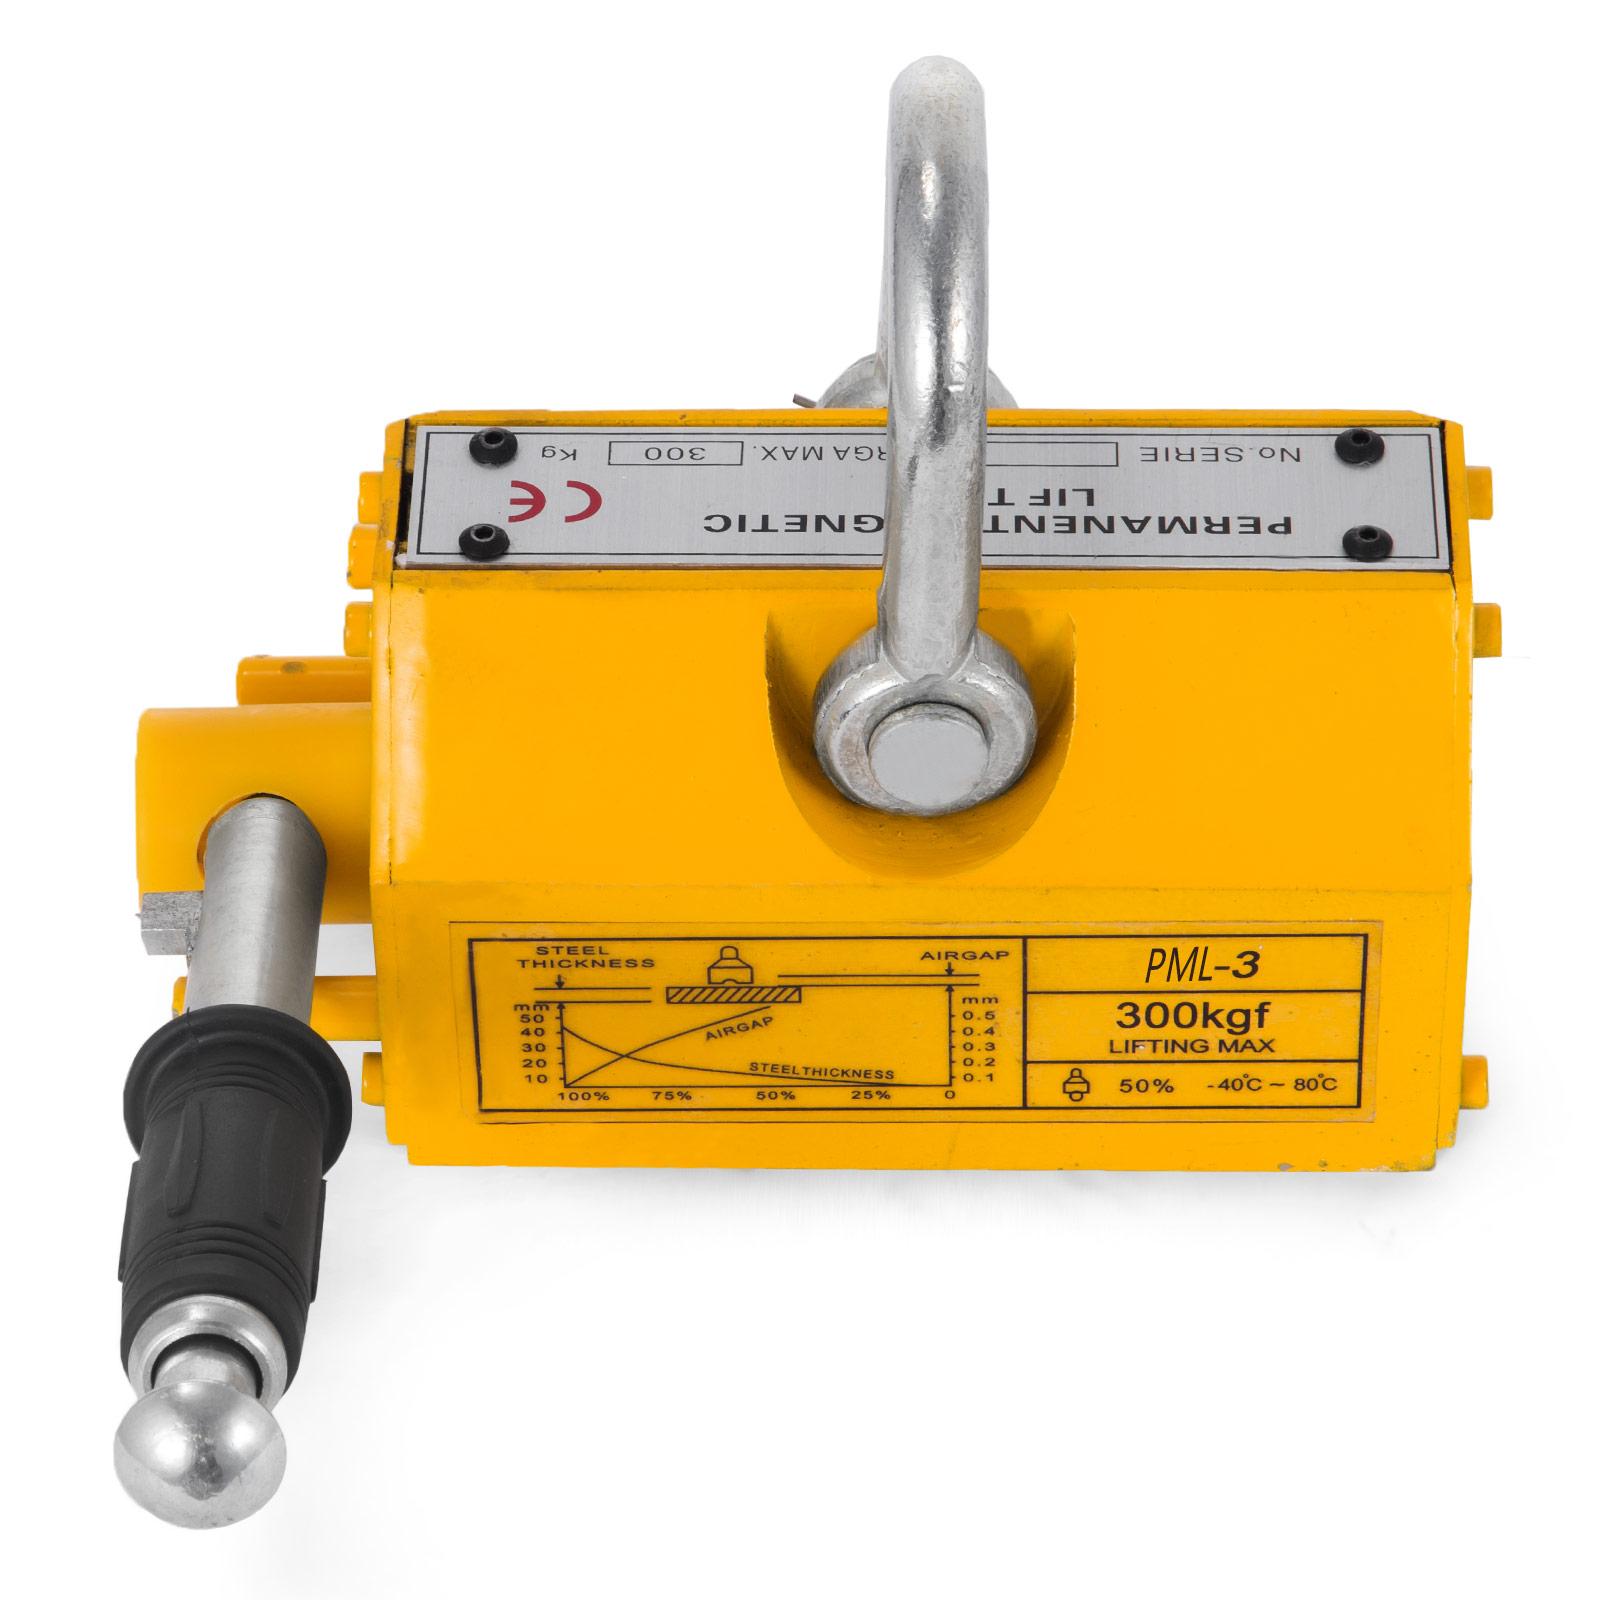 100-300-600-1000KG-Steel-Magnetic-Lifter-Heavy-Duty-Crane-Hoist-Lifting-Magnet miniature 29